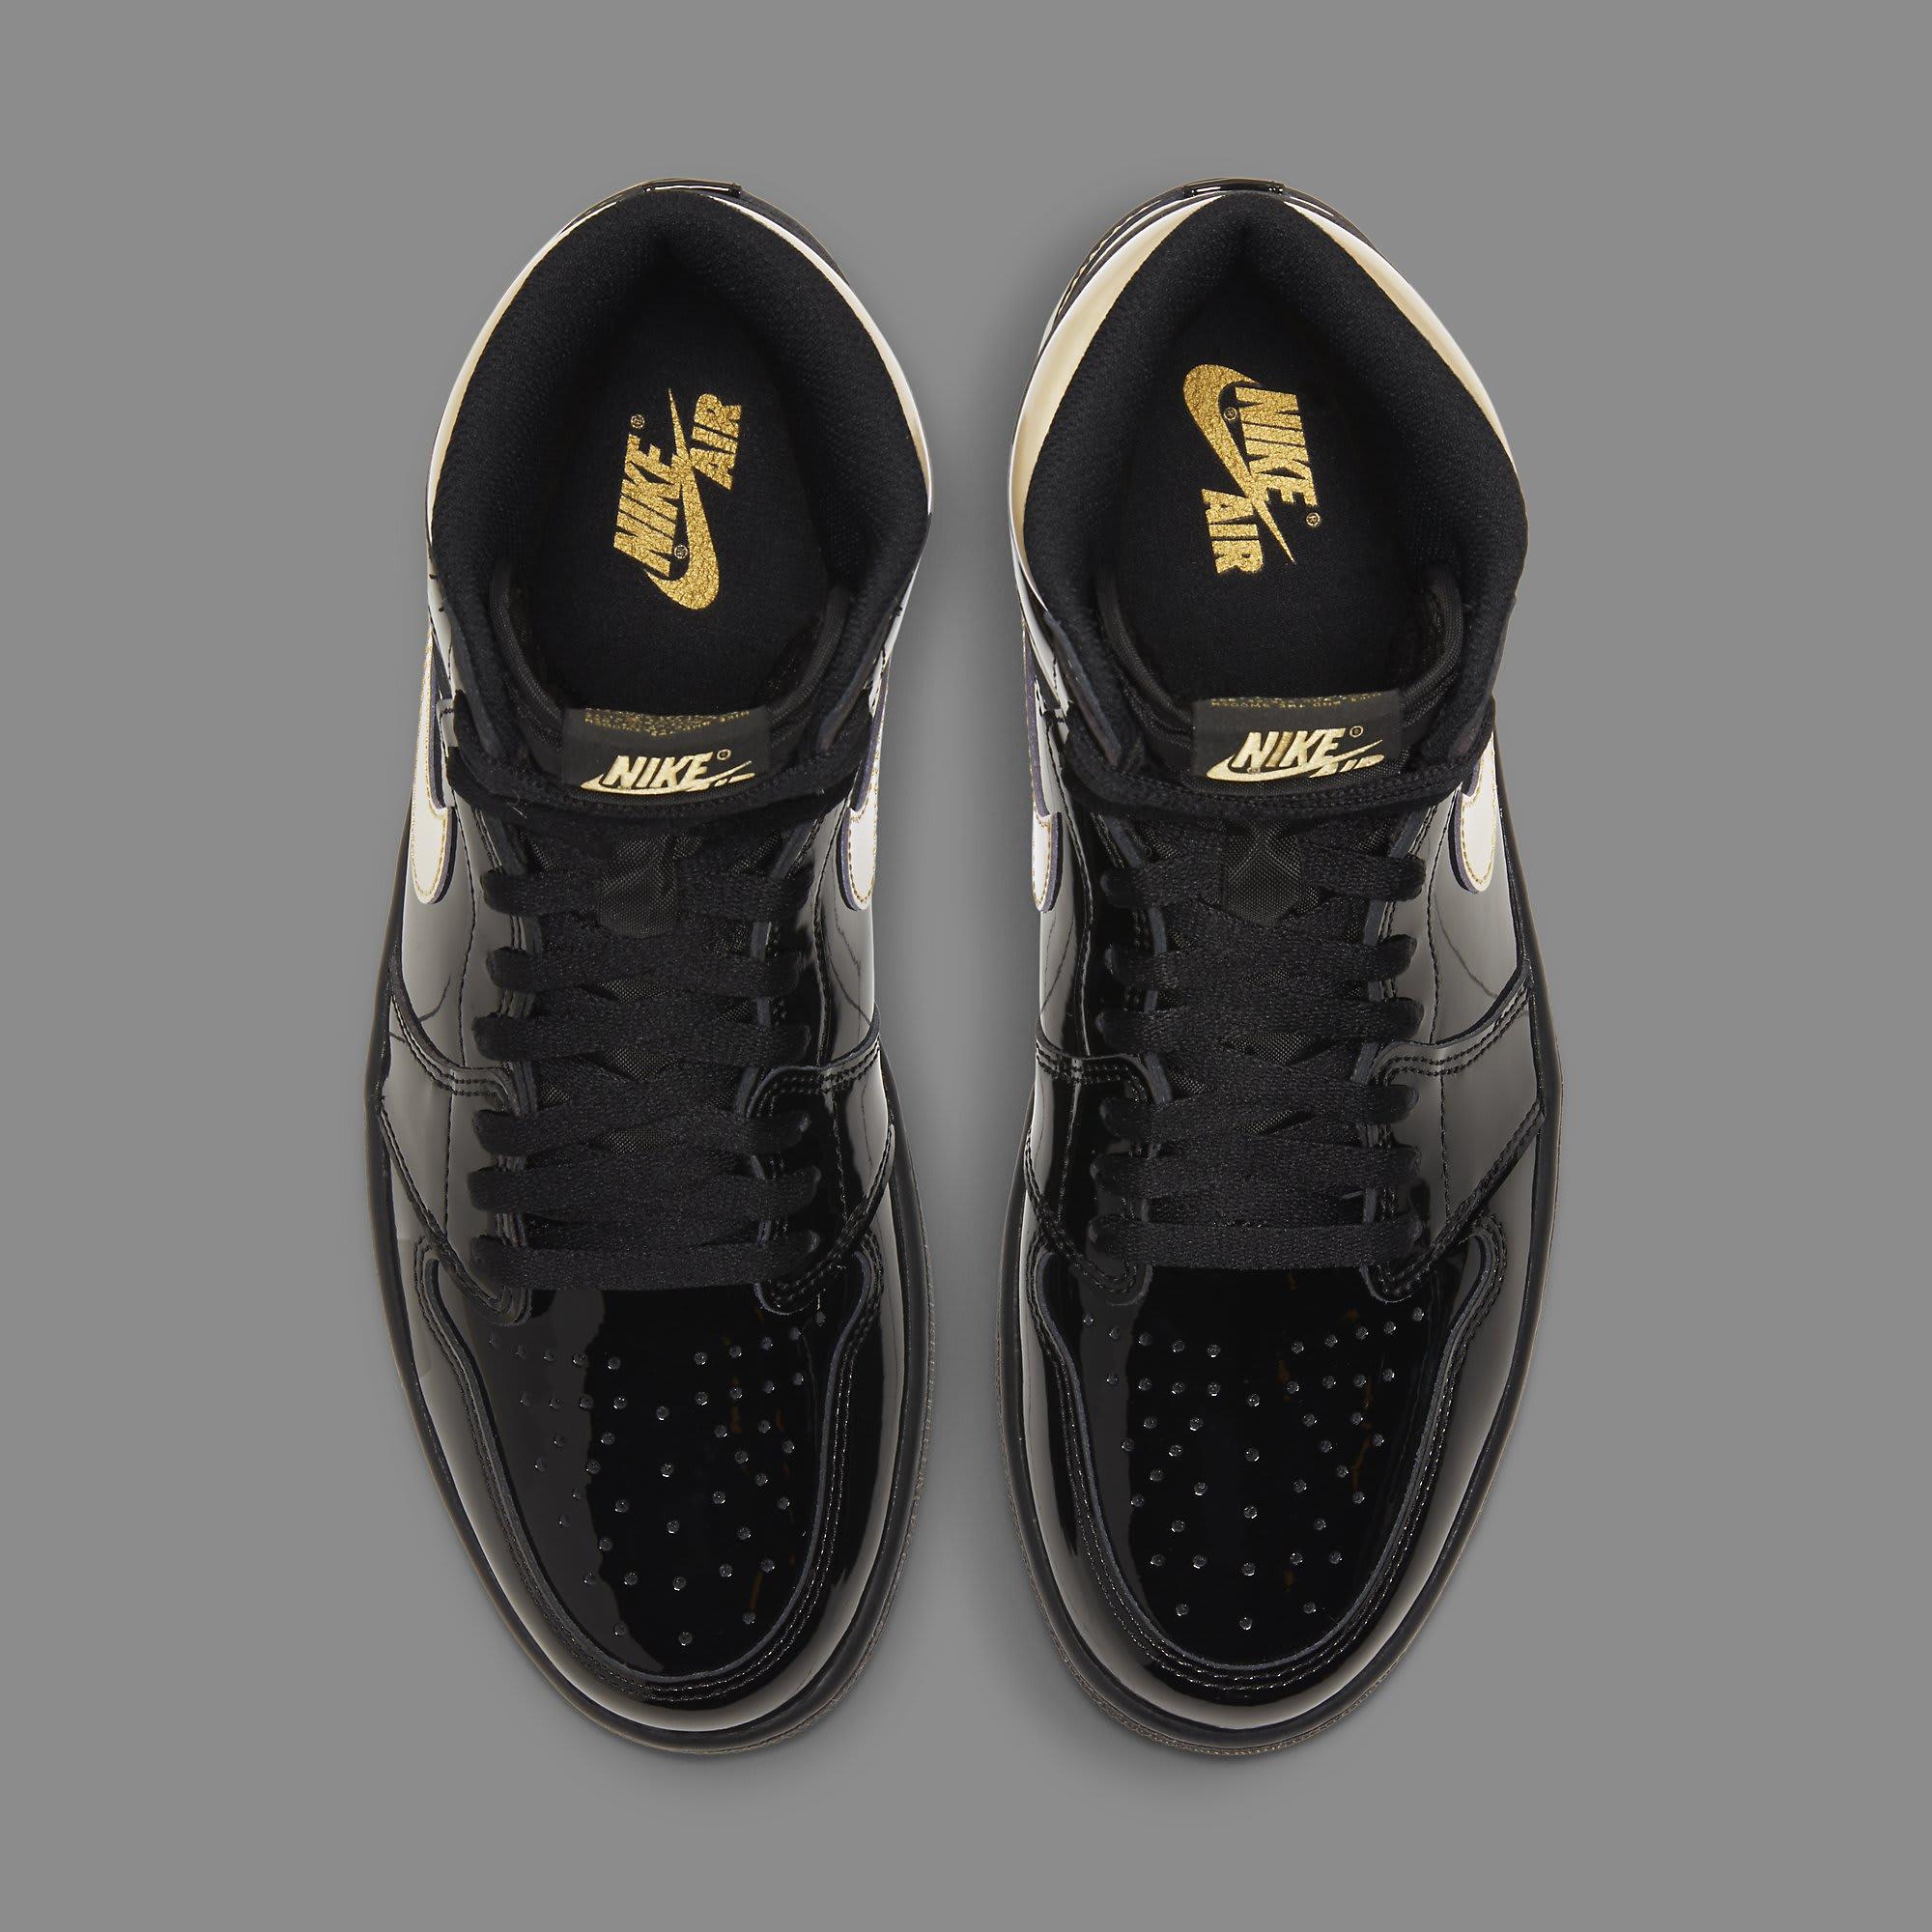 Air Jordan 1 Retro High OG 'Metallic Gold' 555088-032 Top